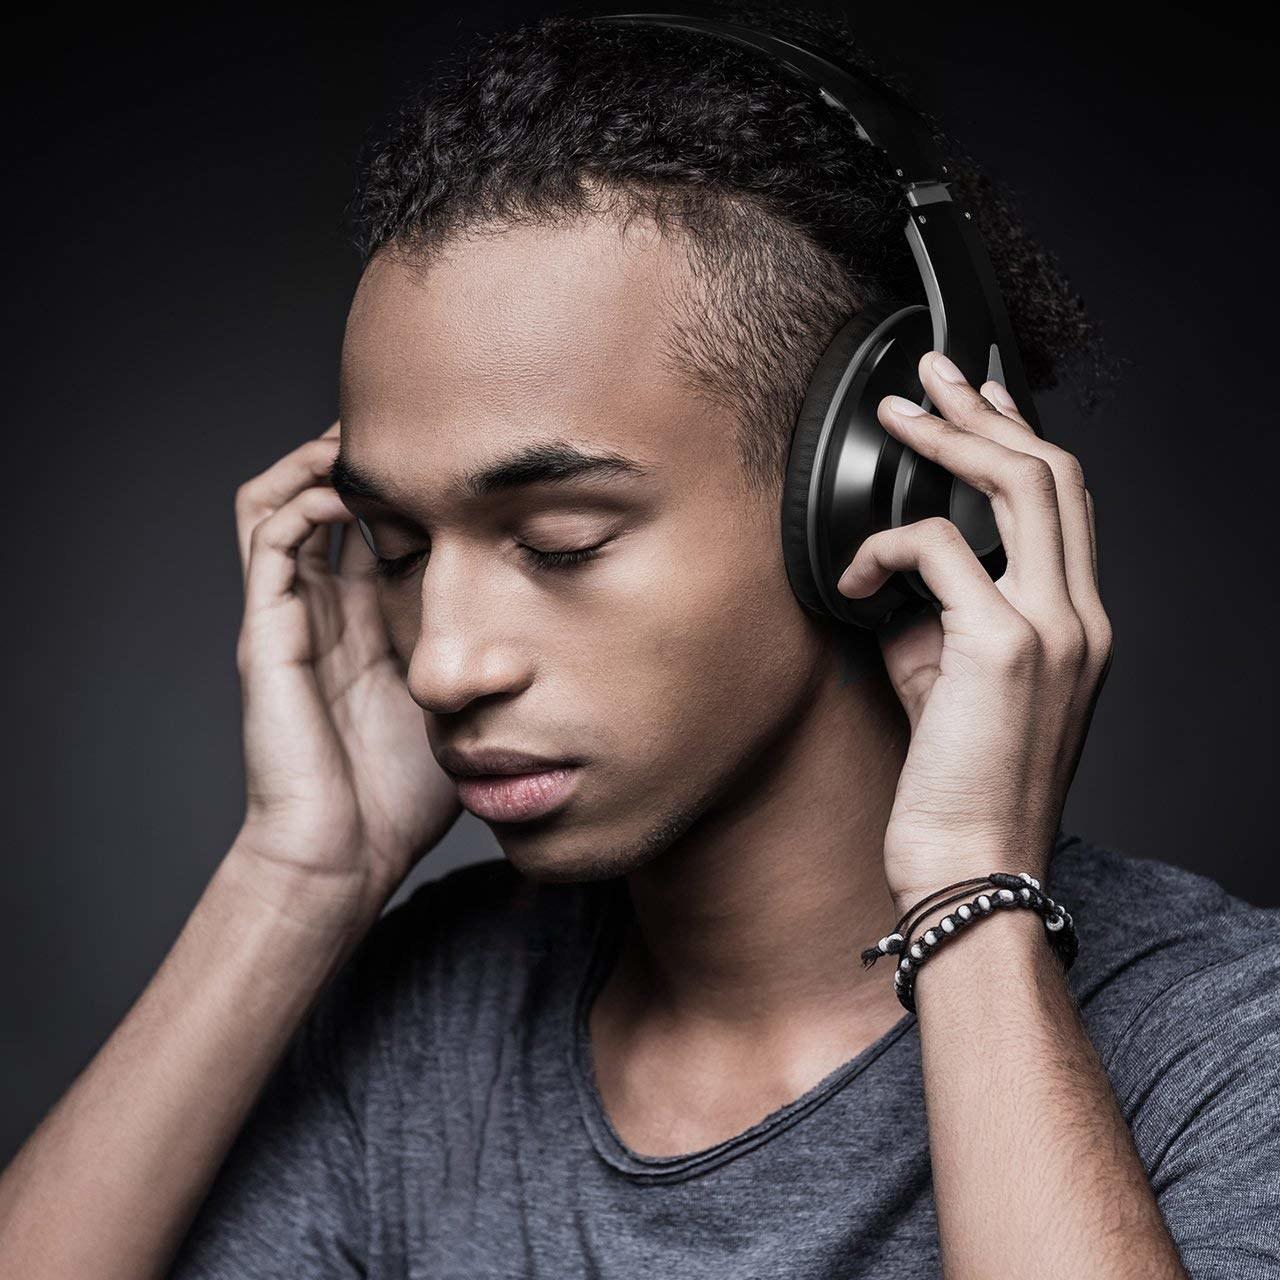 Model using headphones